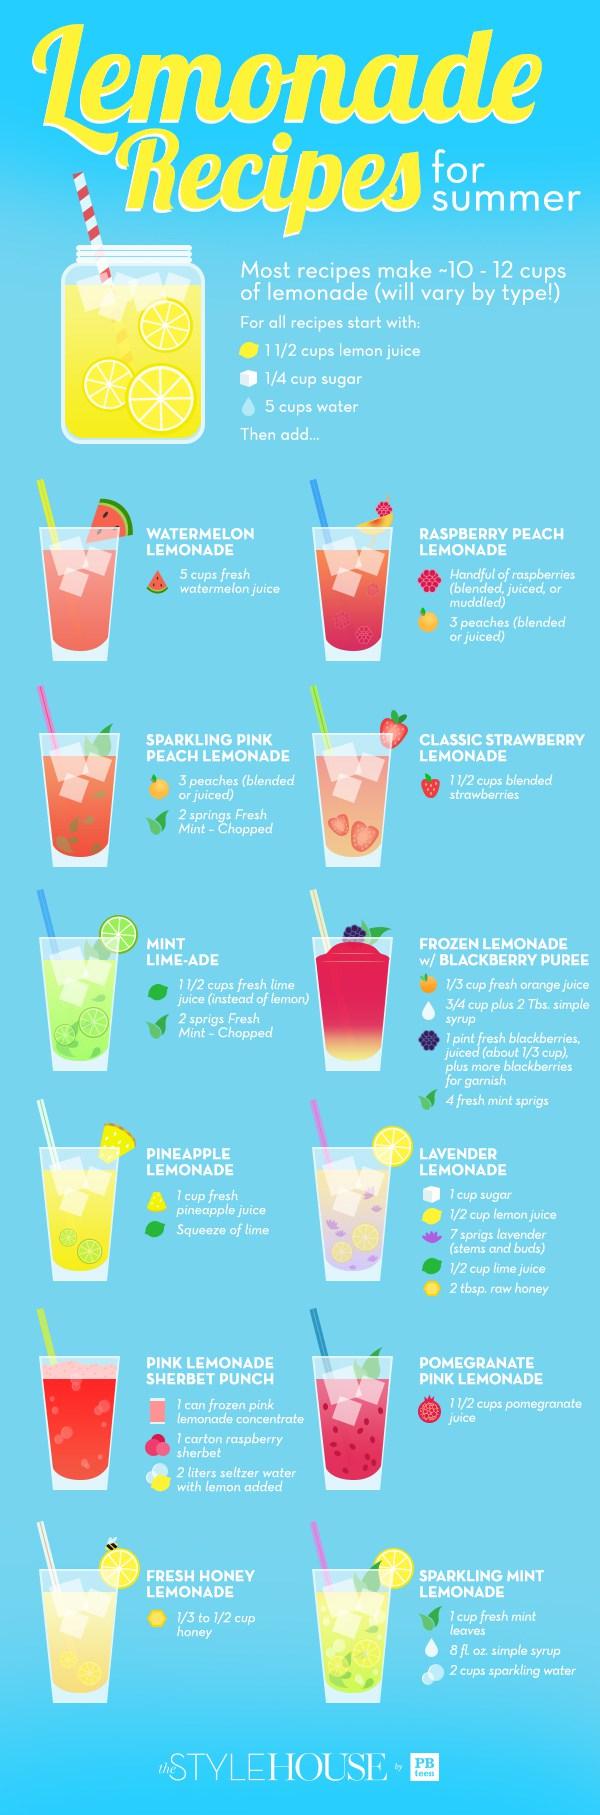 12 Unique Lemonade Recipes